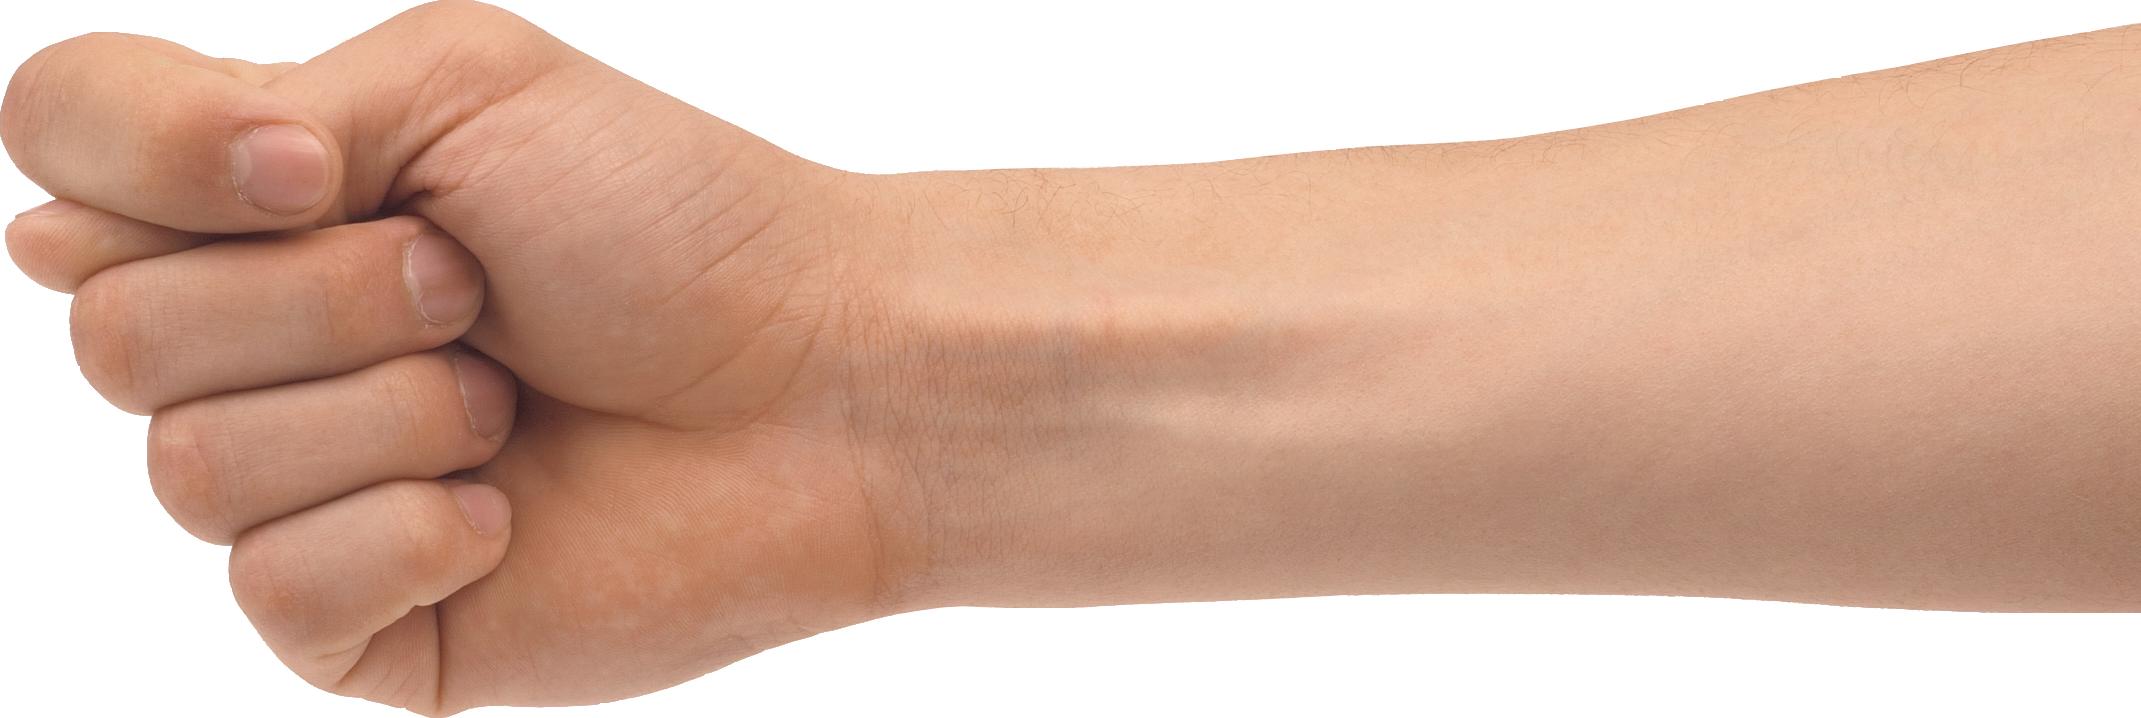 Hand forearm